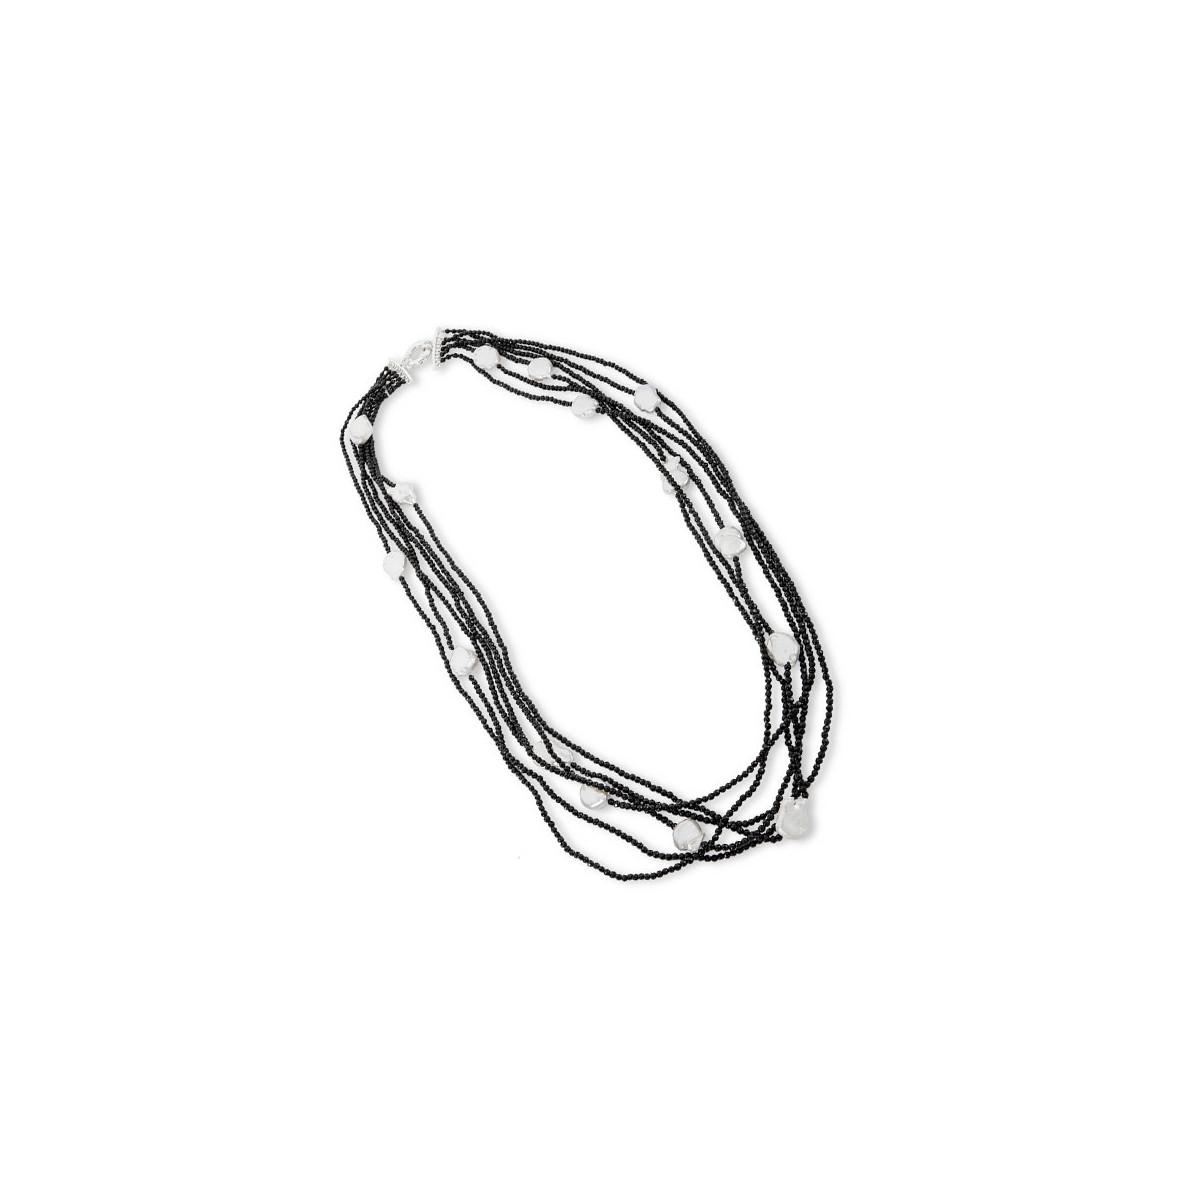 Collar VJ Black & White